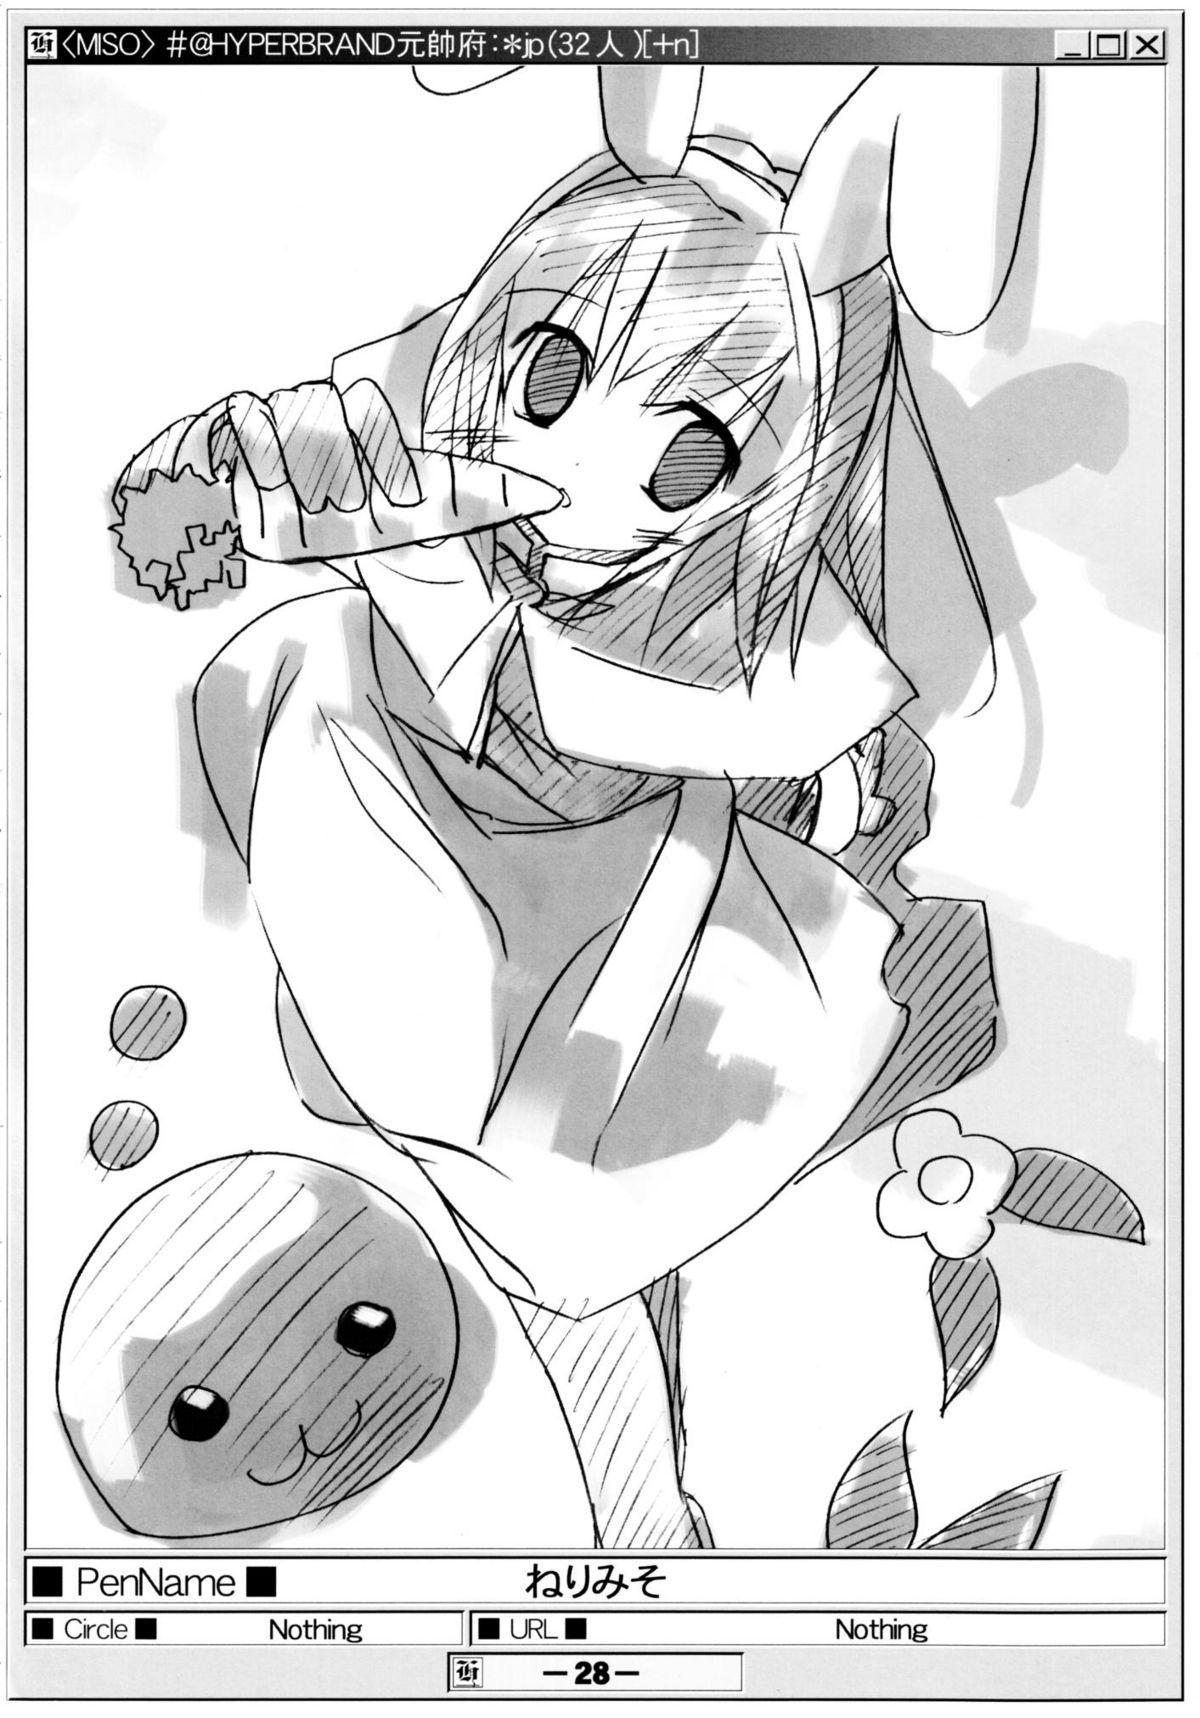 (Puniket 07) [HYPER BRAND (Deden, Ishihara Masumi, Kawamura Yasuhito)]  (Ragnarok Online) 26